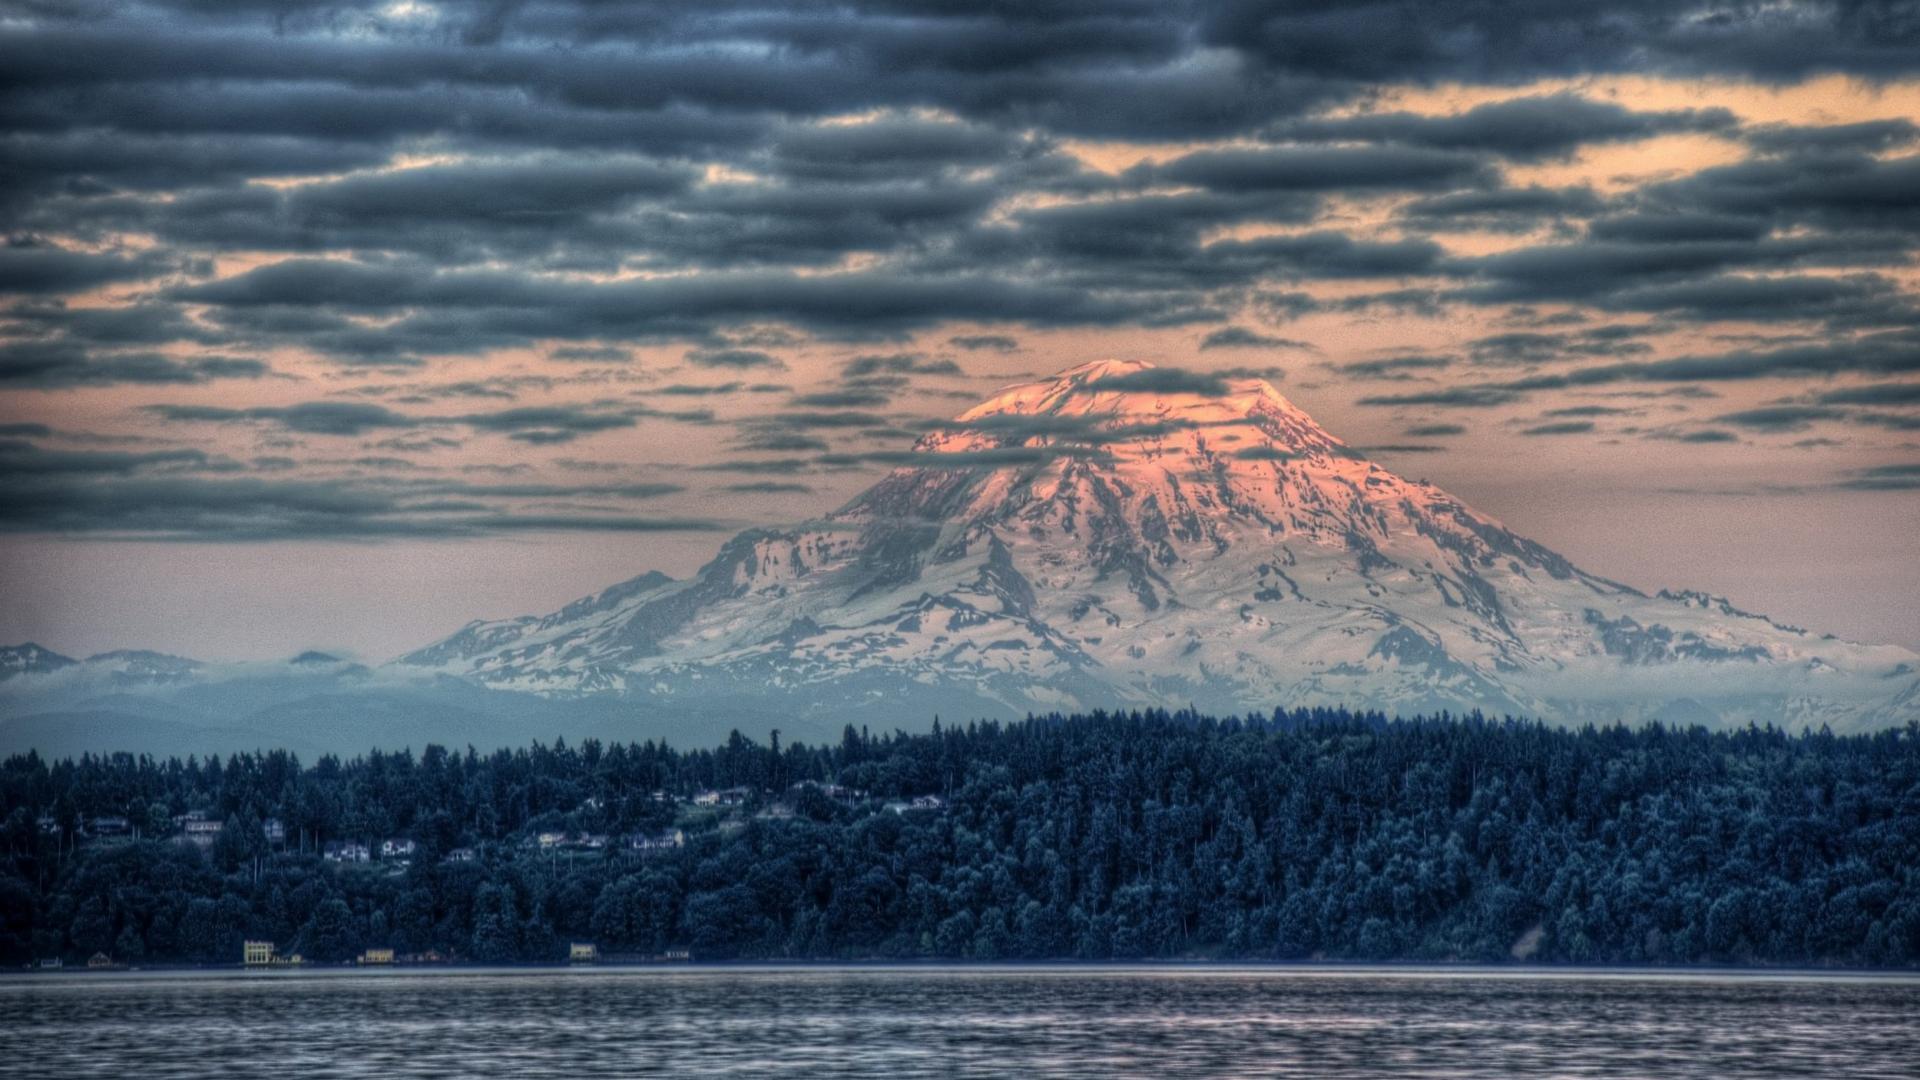 Mount Rainier National Park Wallpapers 1920x1080